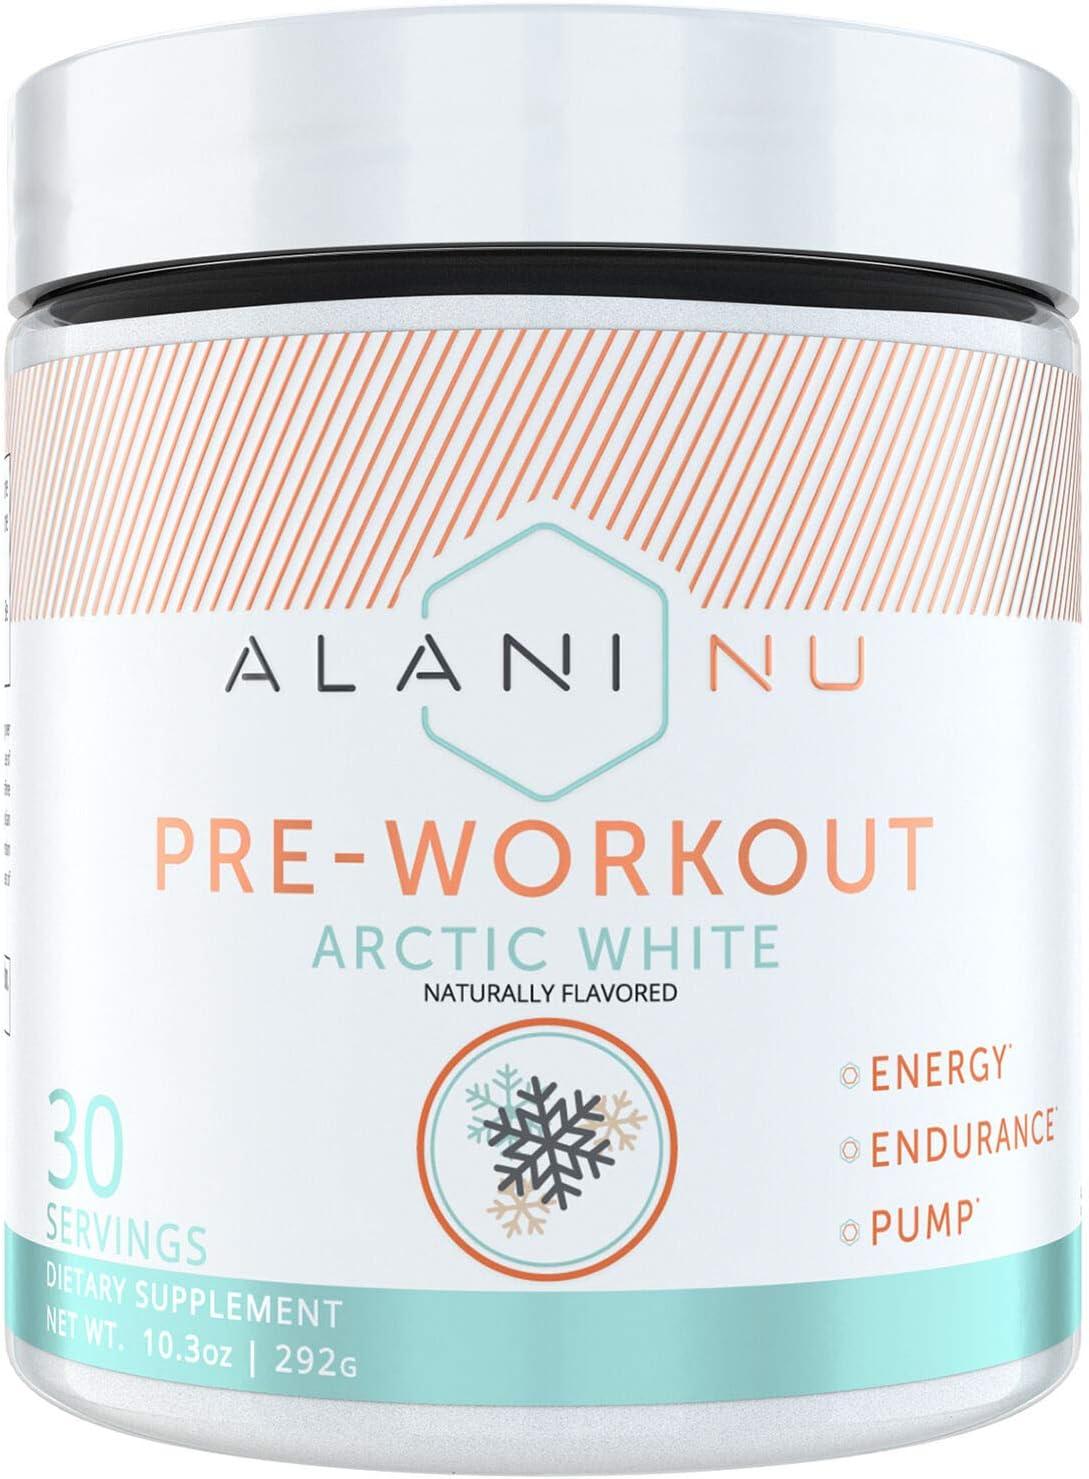 Alani Nu Pre-Workout – Arctic White